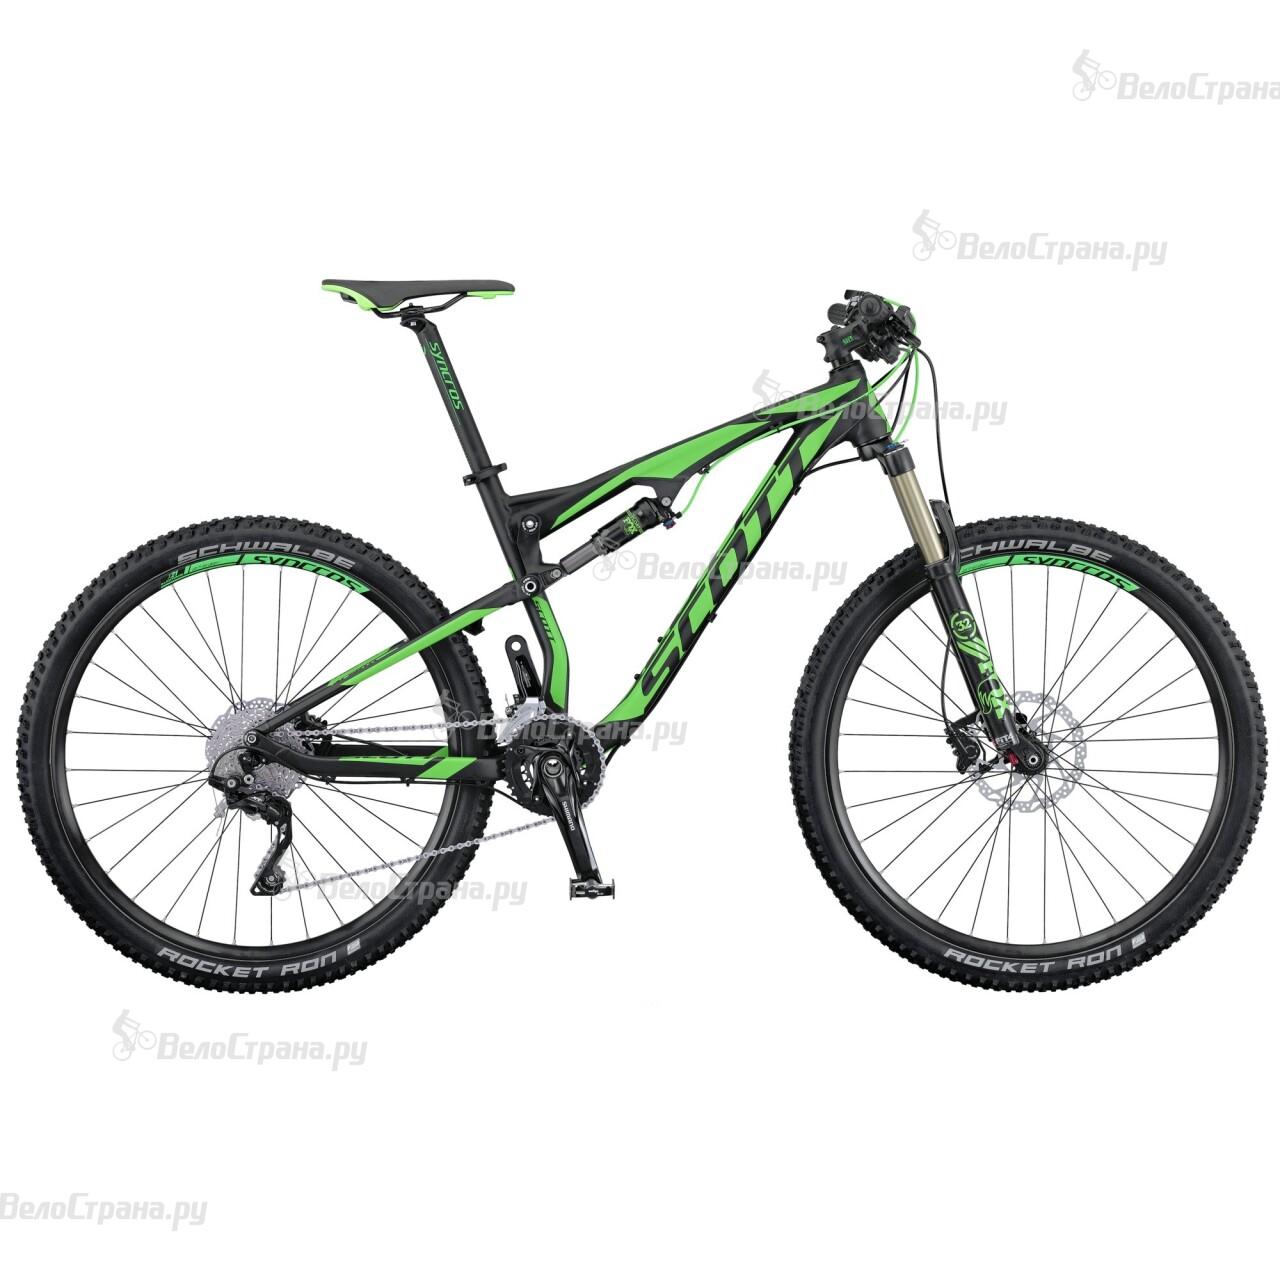 Велосипед Scott Spark 950 (2016) scott spark 750 2017